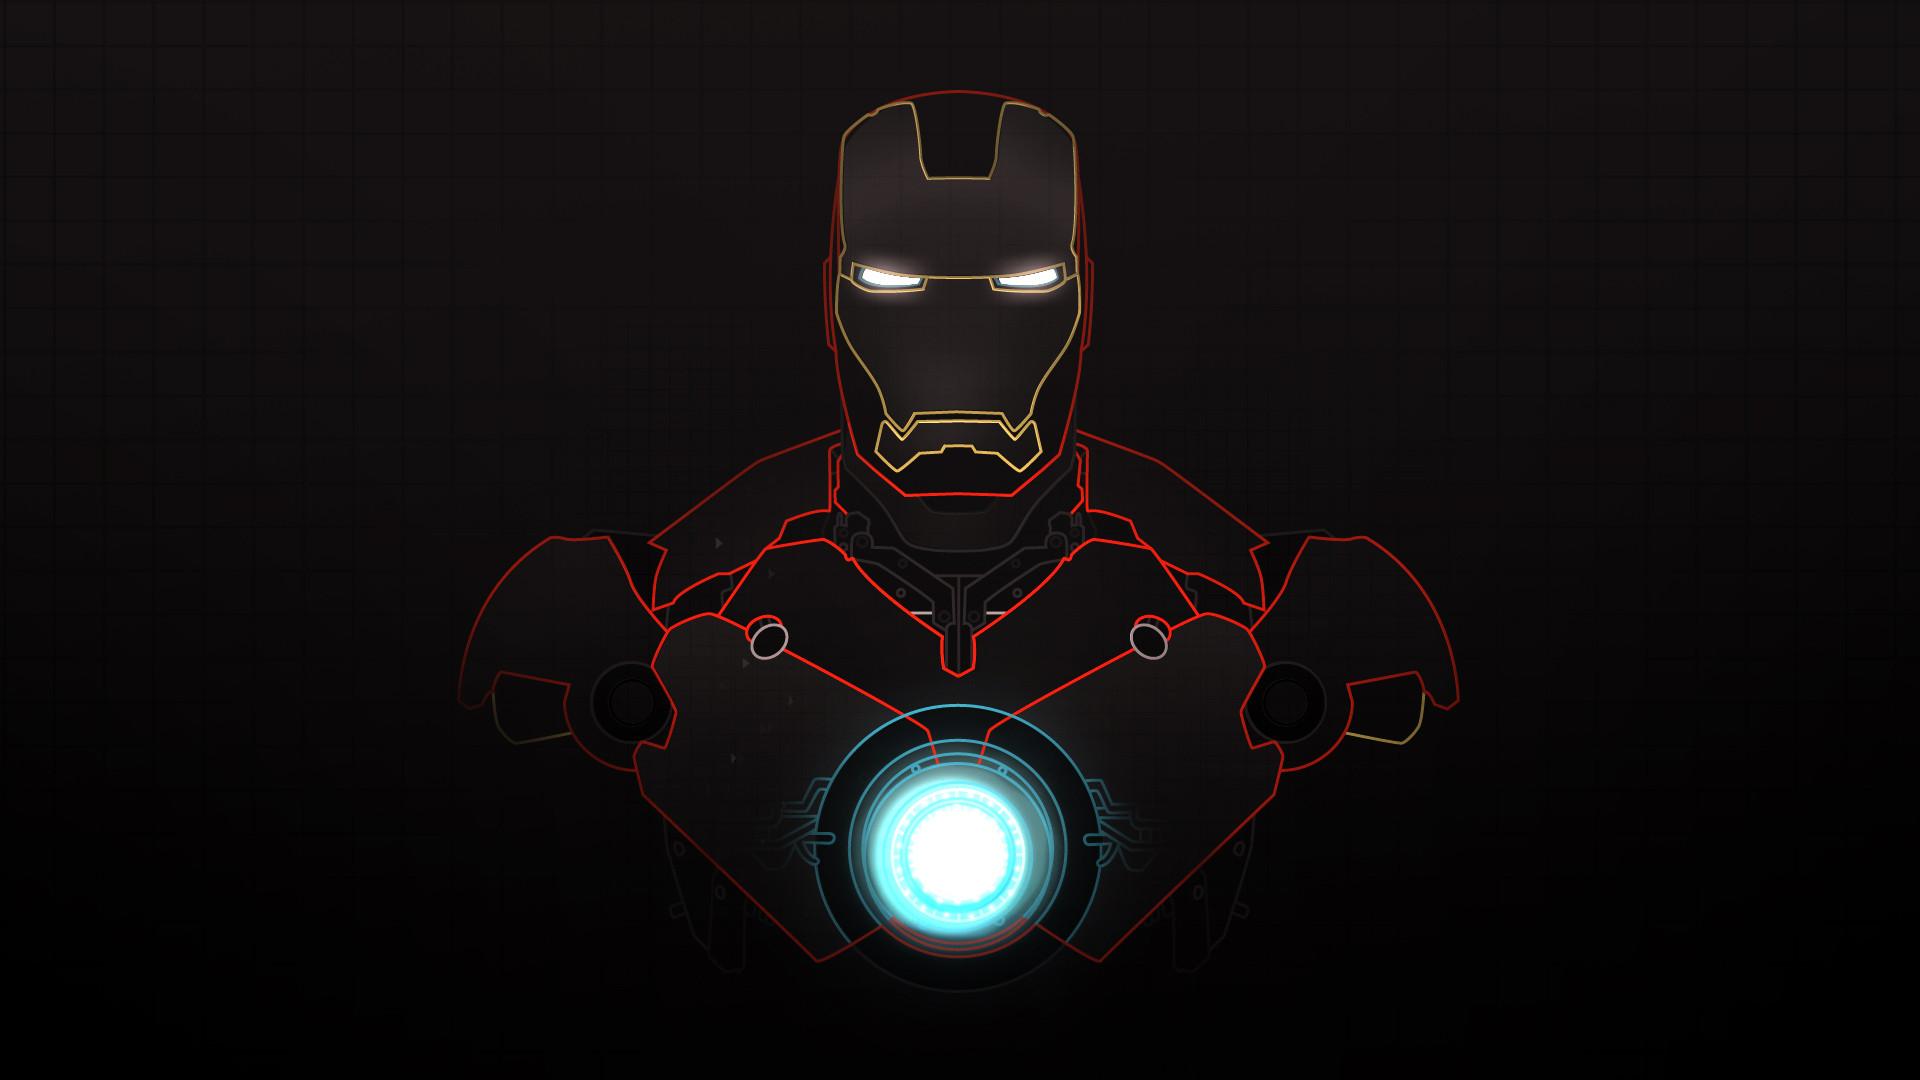 Cool Iron Man Wallpaper 6794